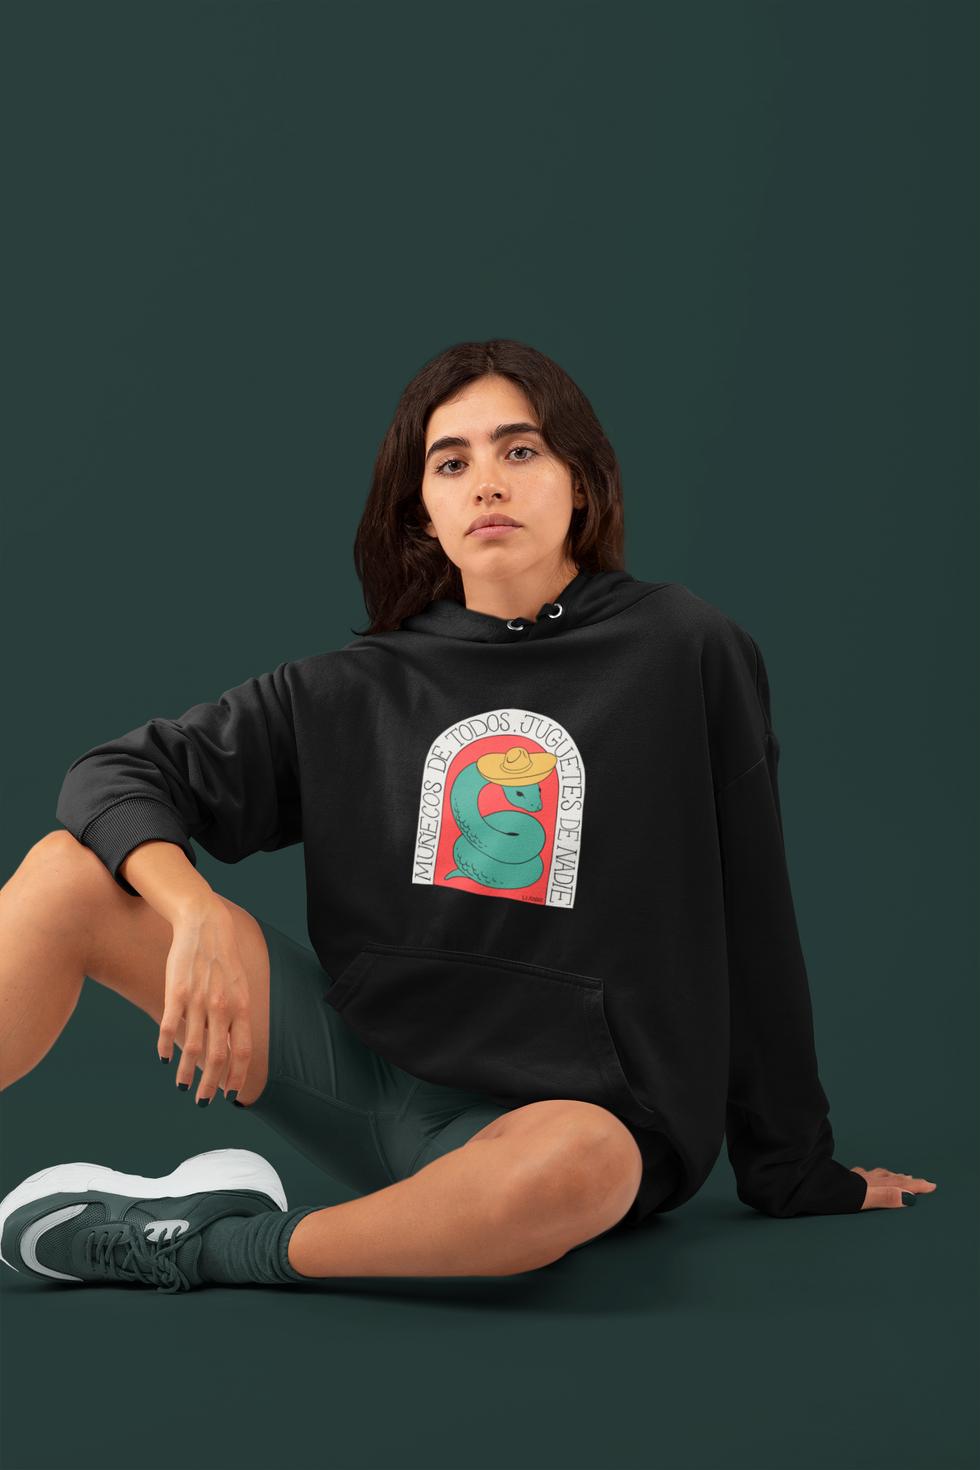 monochromatic-sweatshirt-mockup-featurin